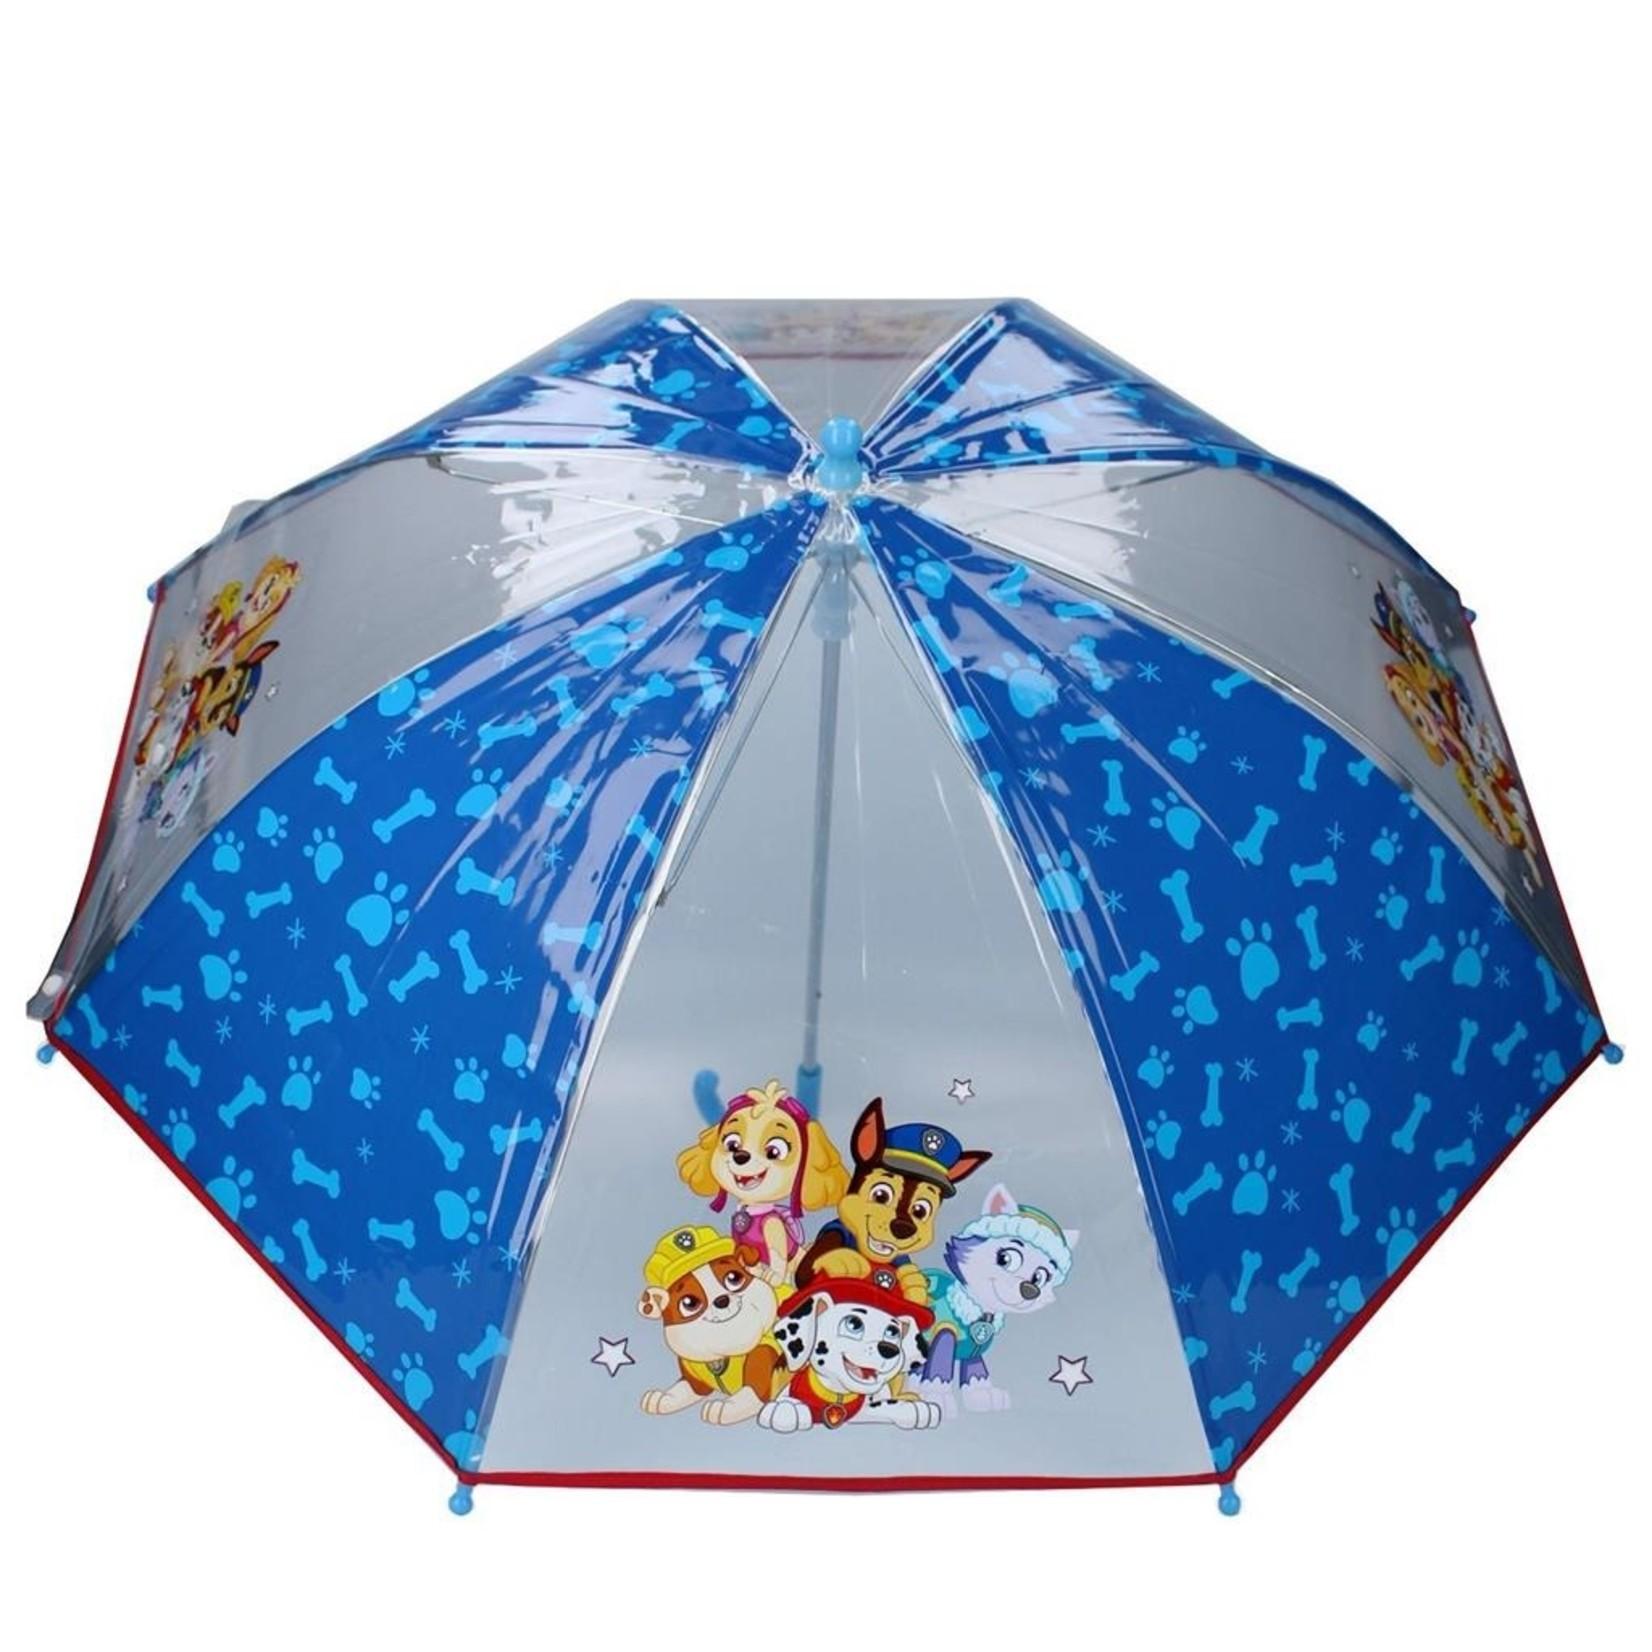 PAW Patrol Paraplu Party